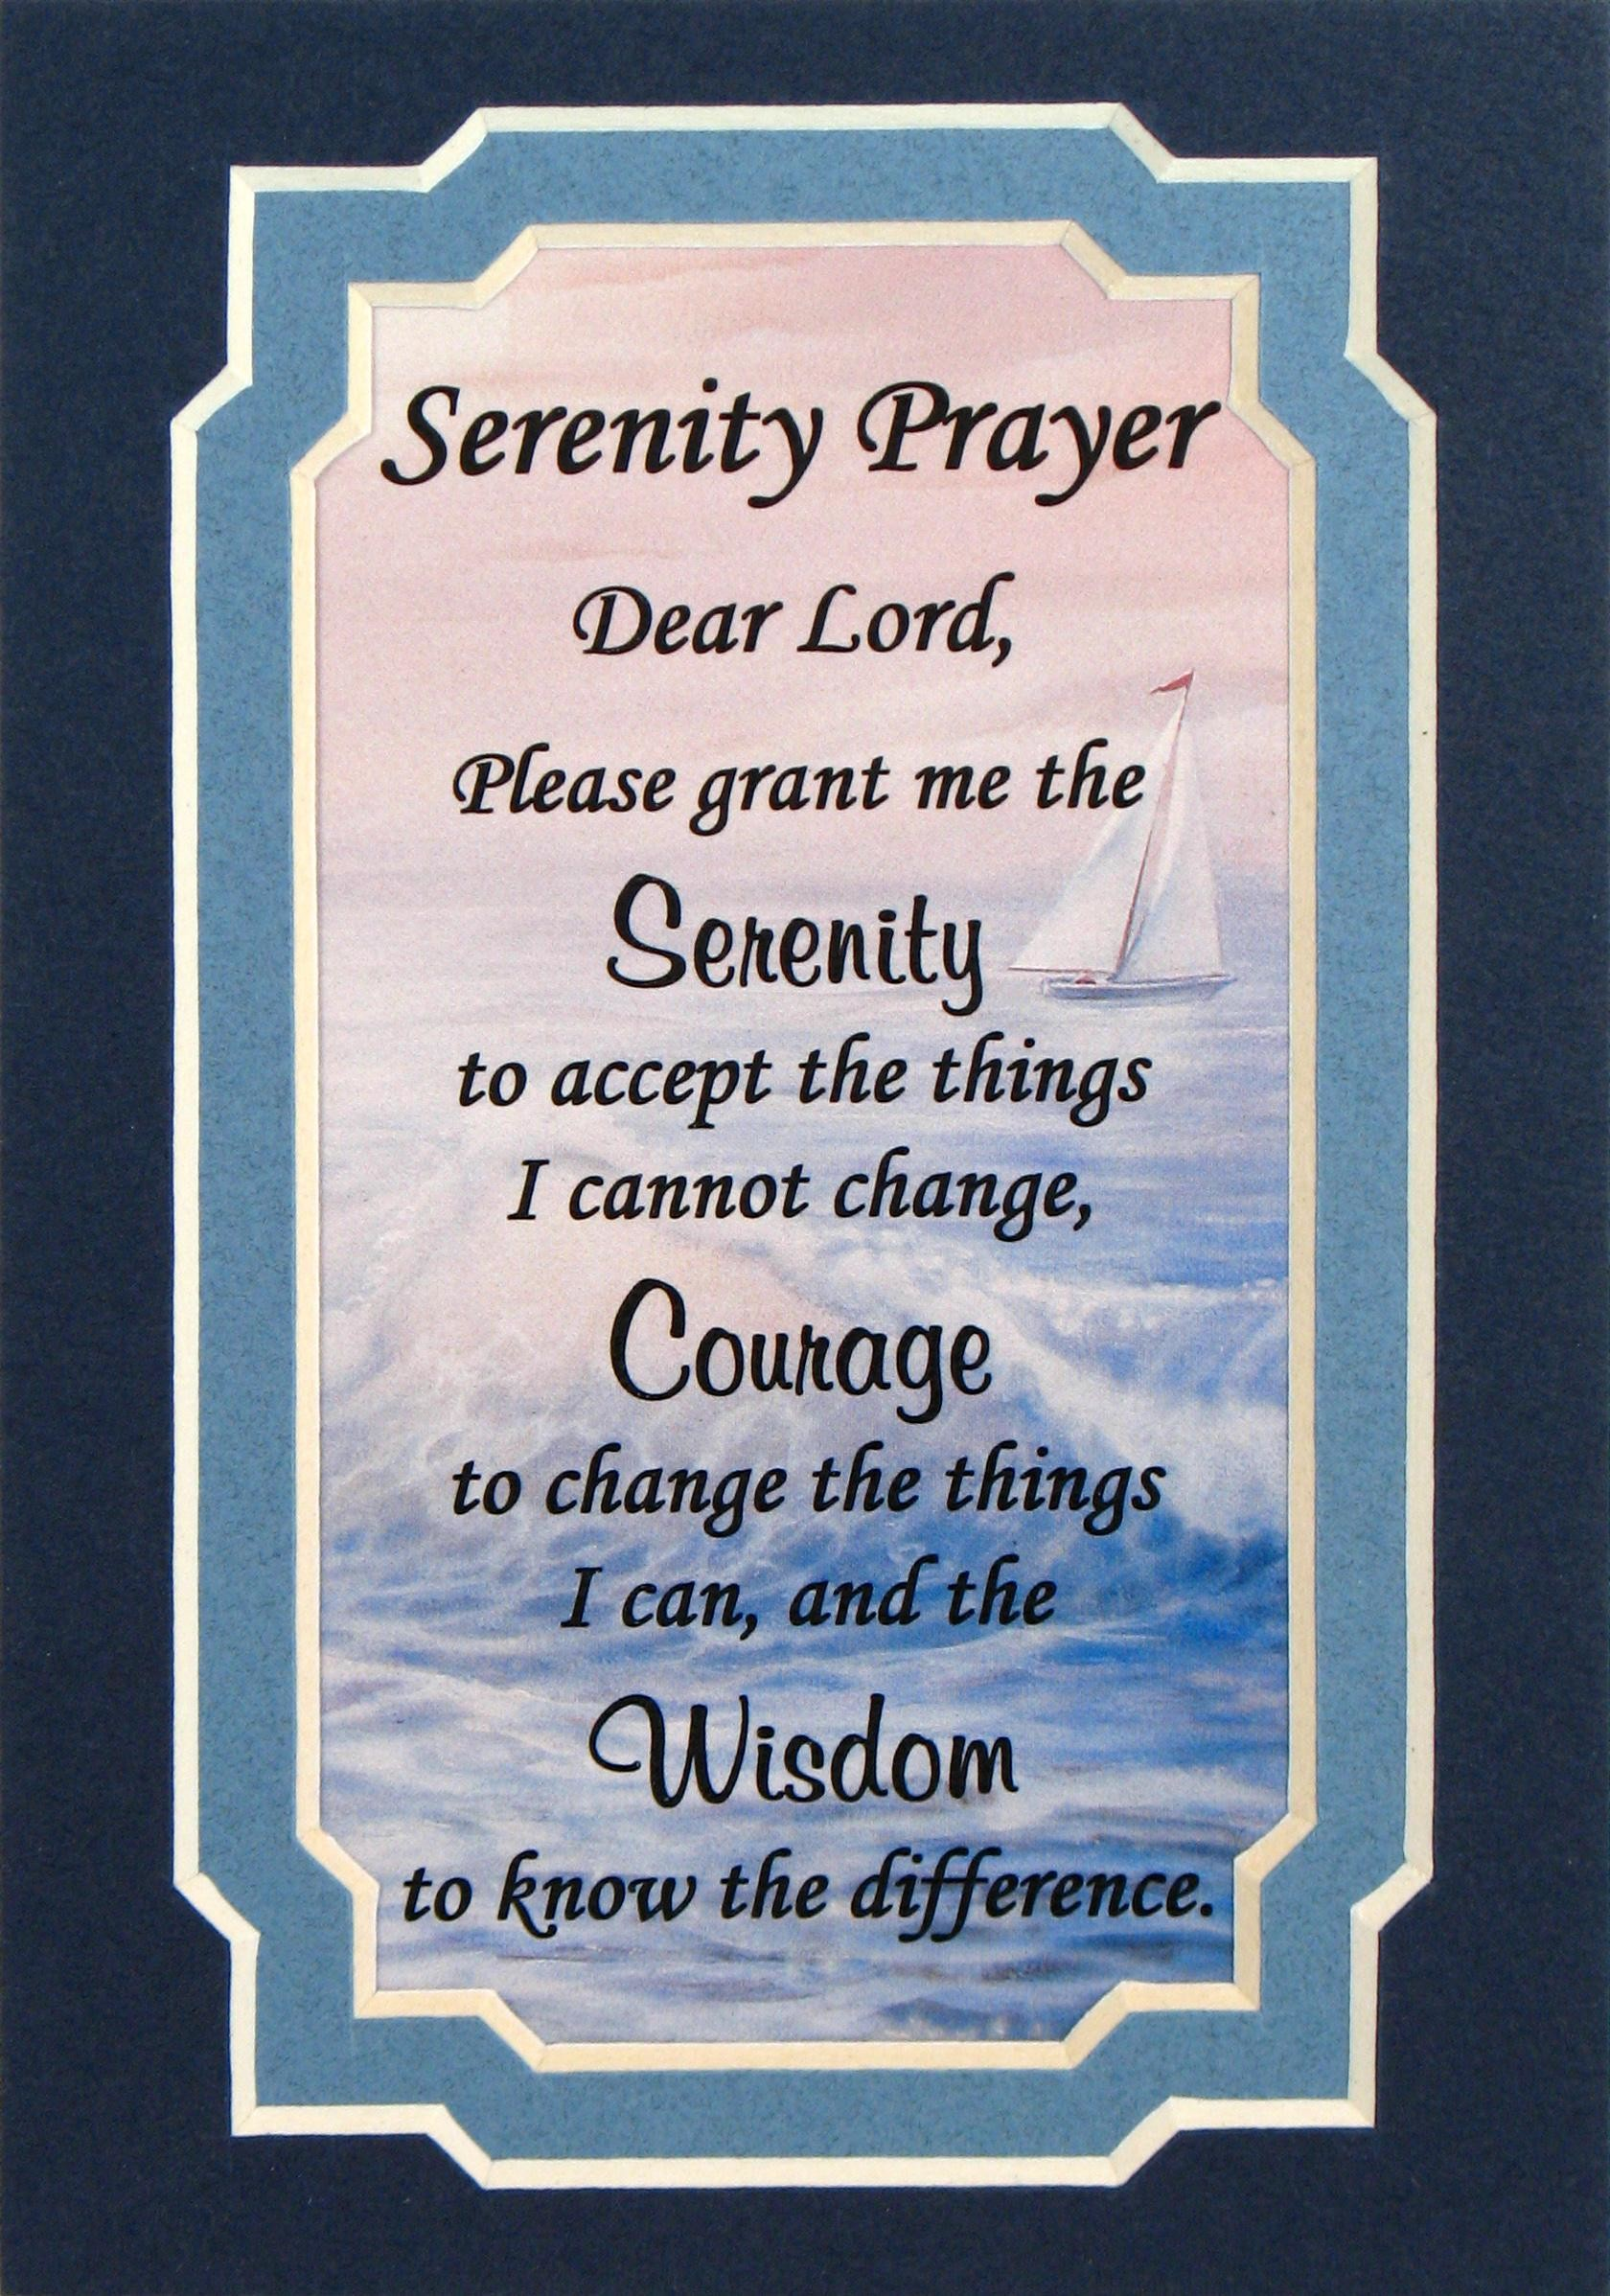 Serenity Prayer Iphone Wallpaper 69 Images